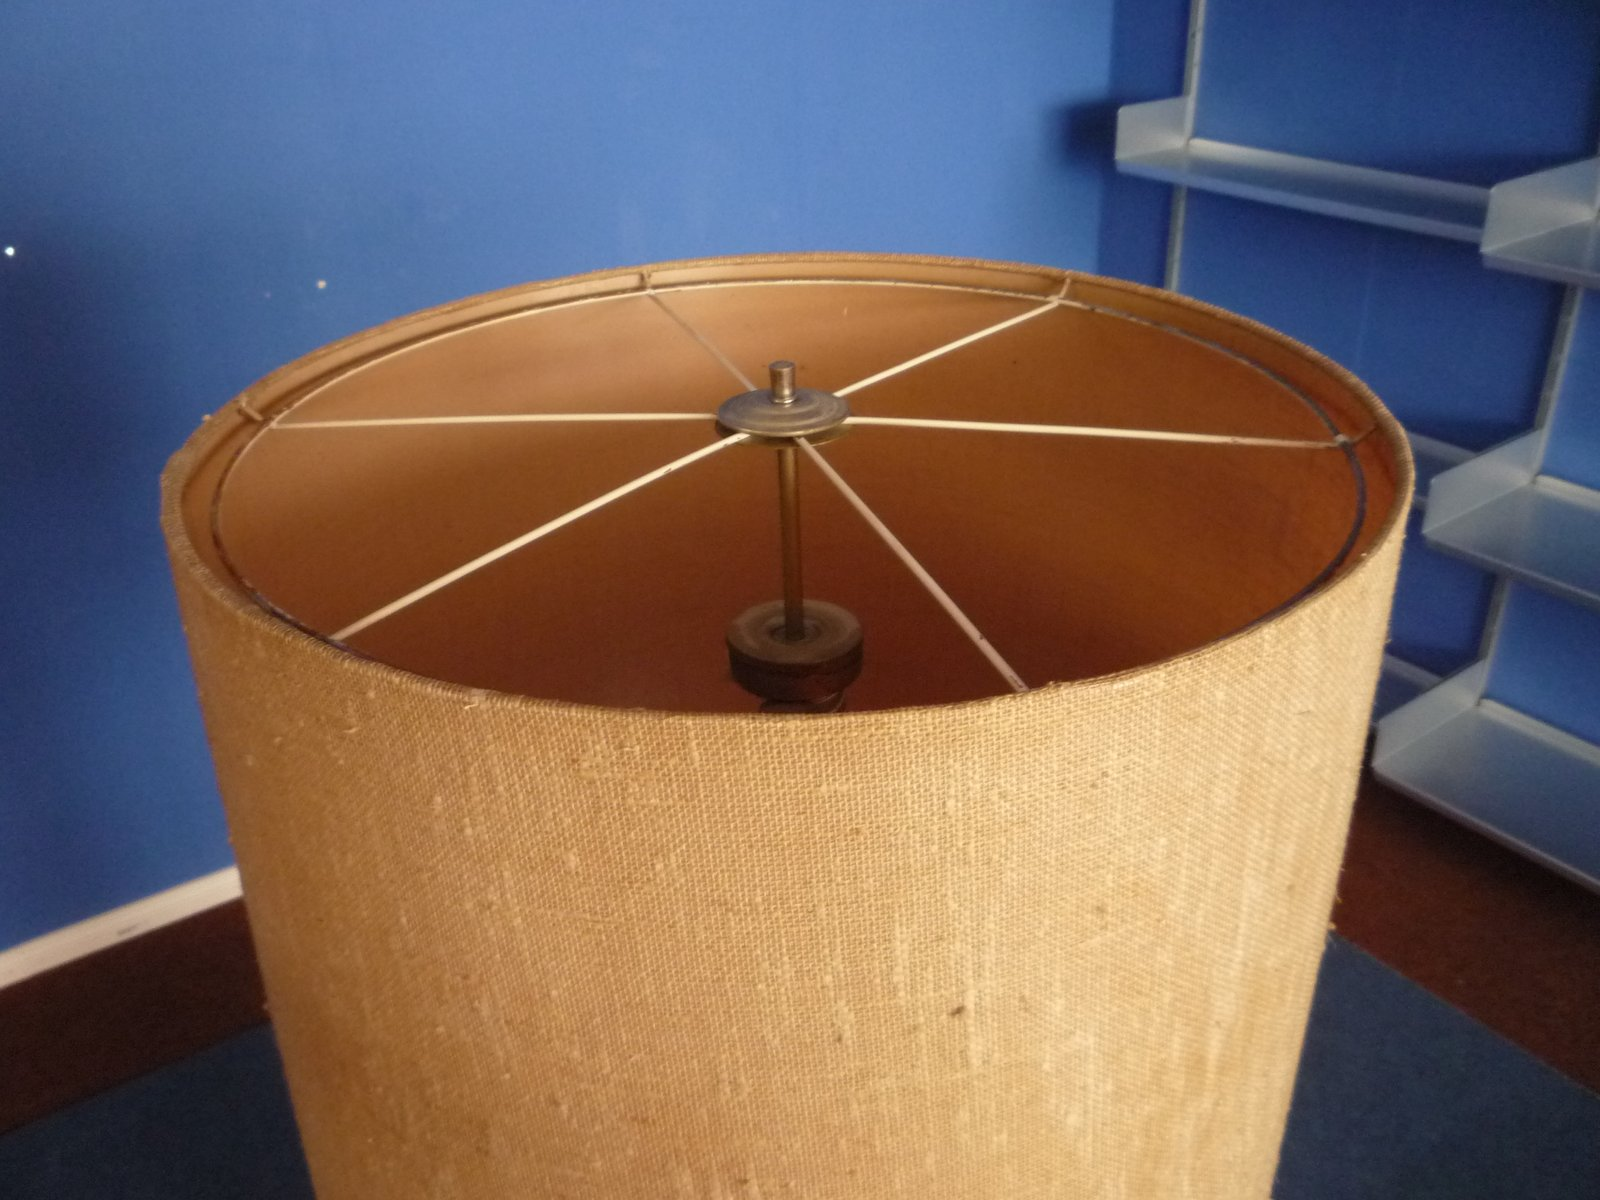 gro e keramik stehlampe 1960er bei pamono kaufen. Black Bedroom Furniture Sets. Home Design Ideas